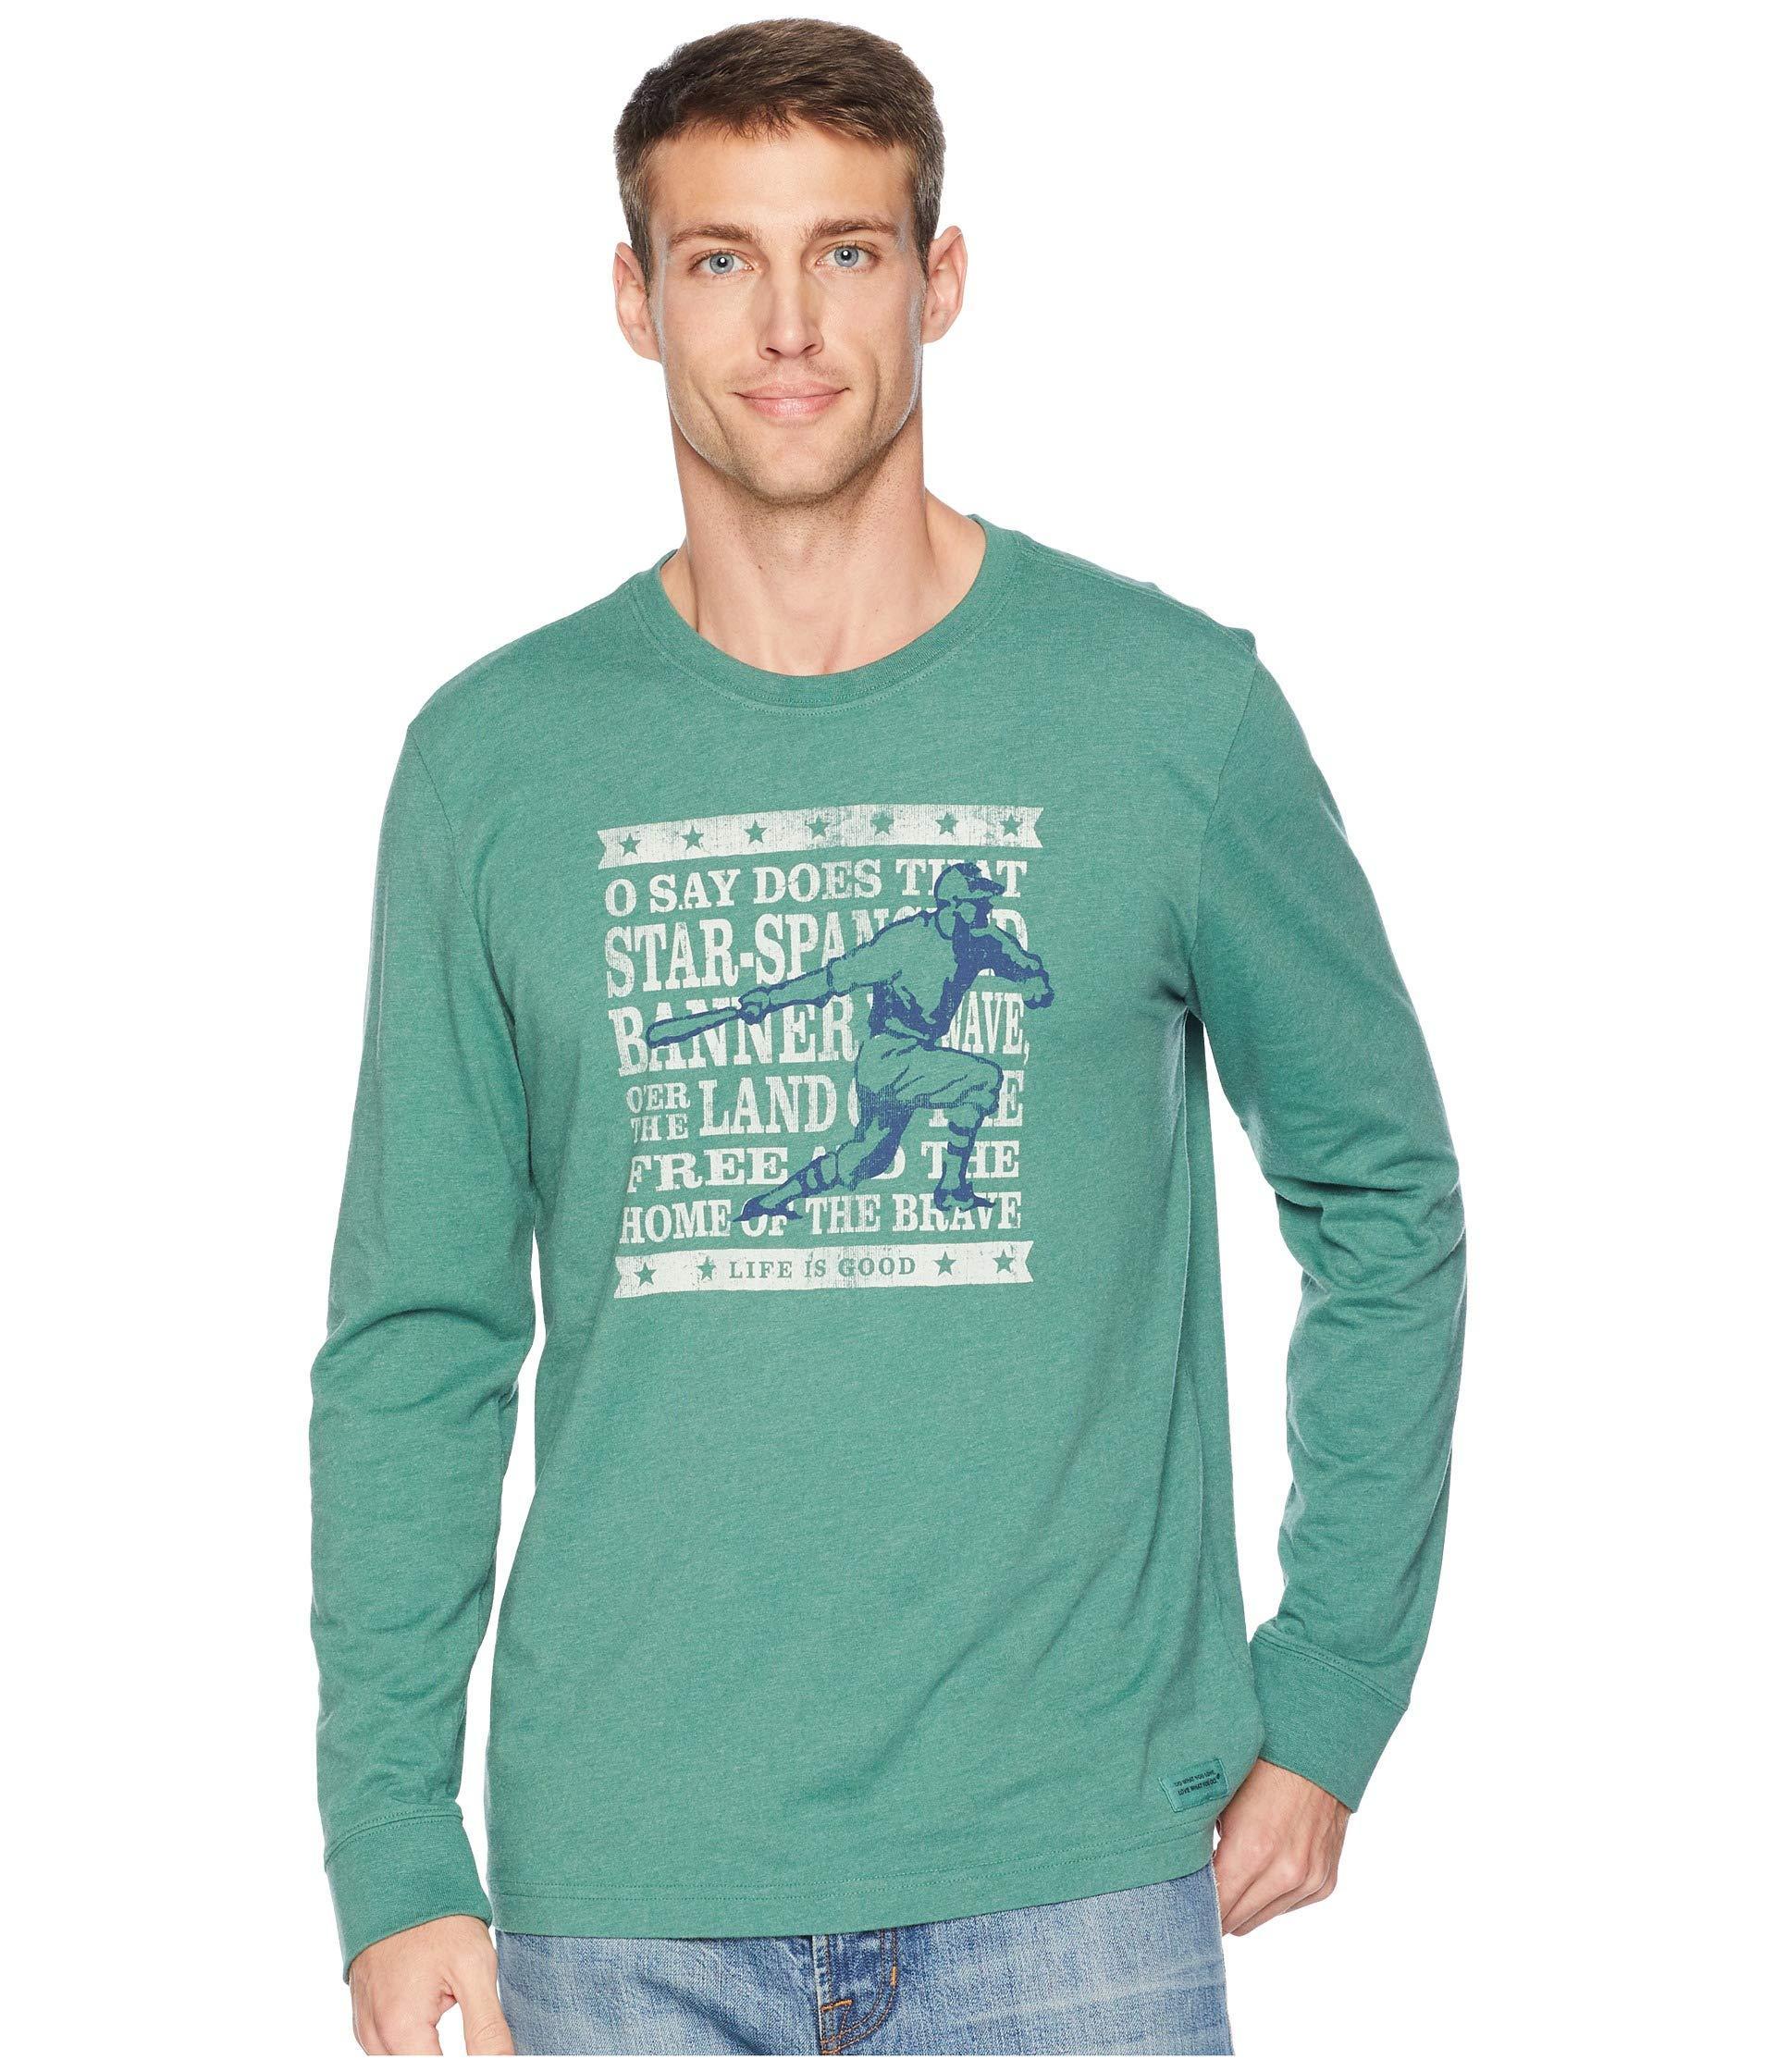 c99741e8035723 Life Is Good. Brave Baseball Crusher Long Sleeve T-shirt in Green ...